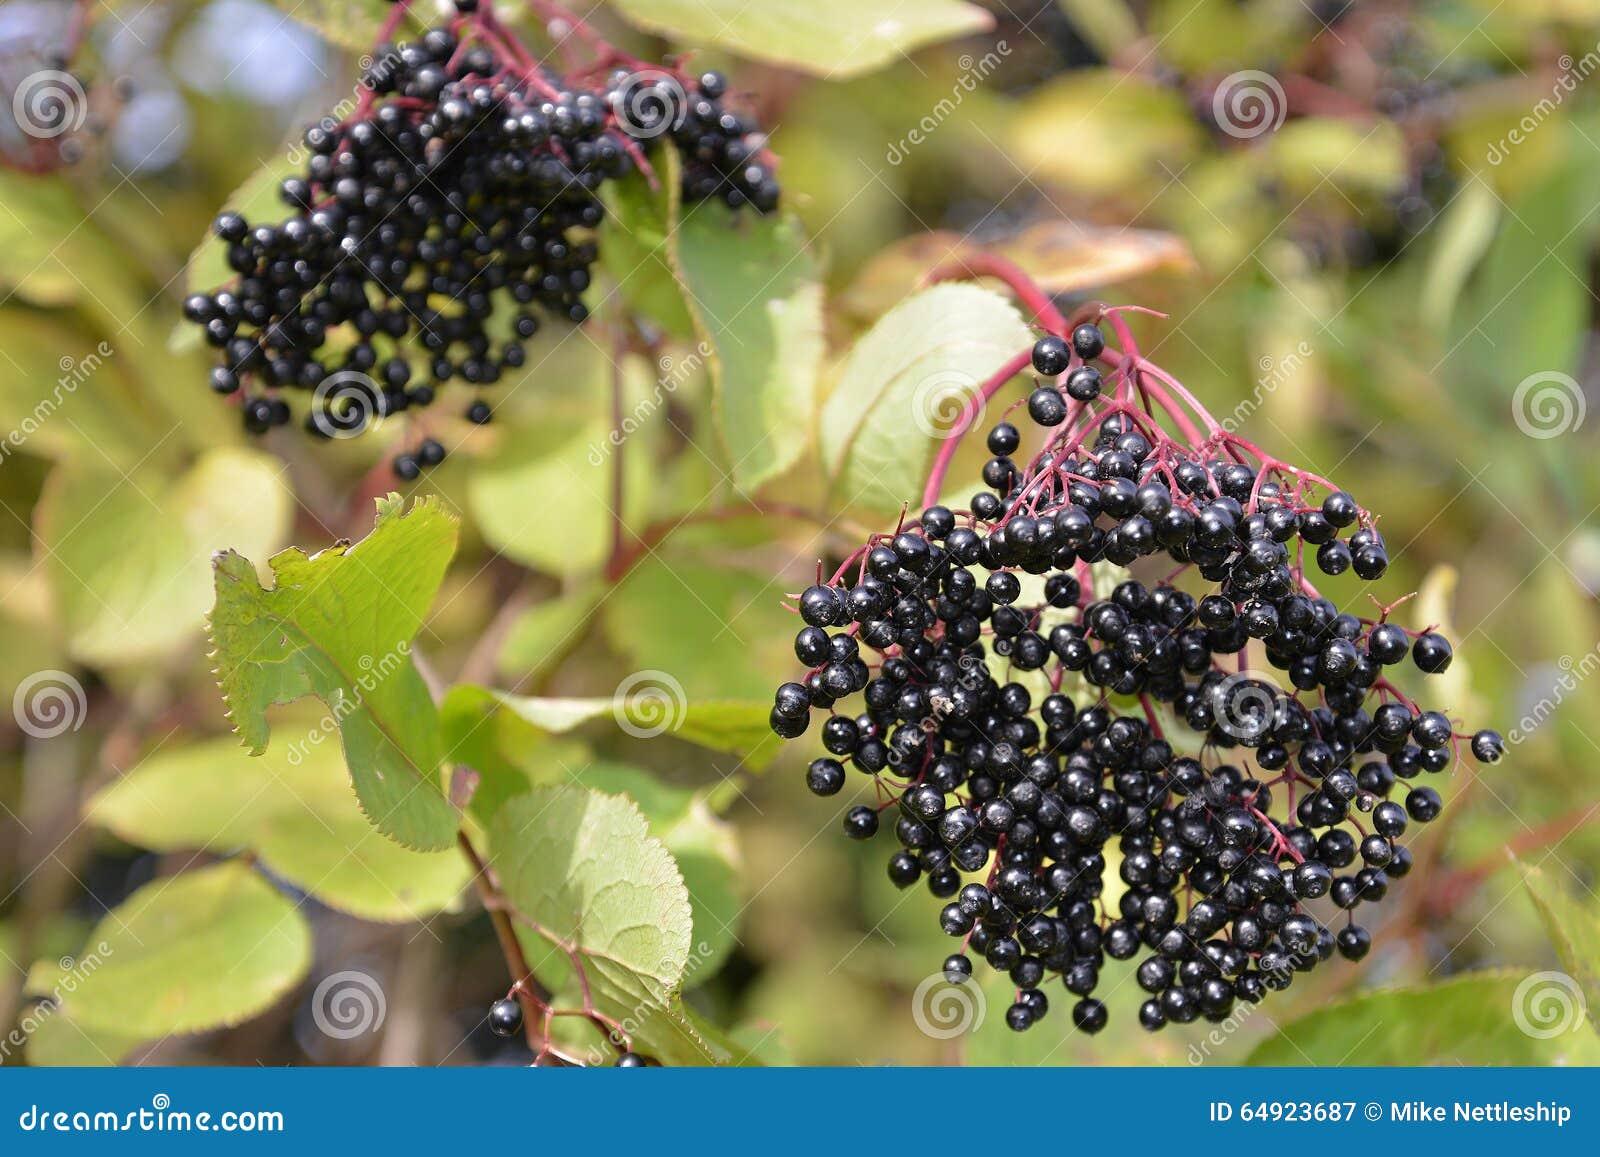 Autumn bunch of ripe elderberry fruit